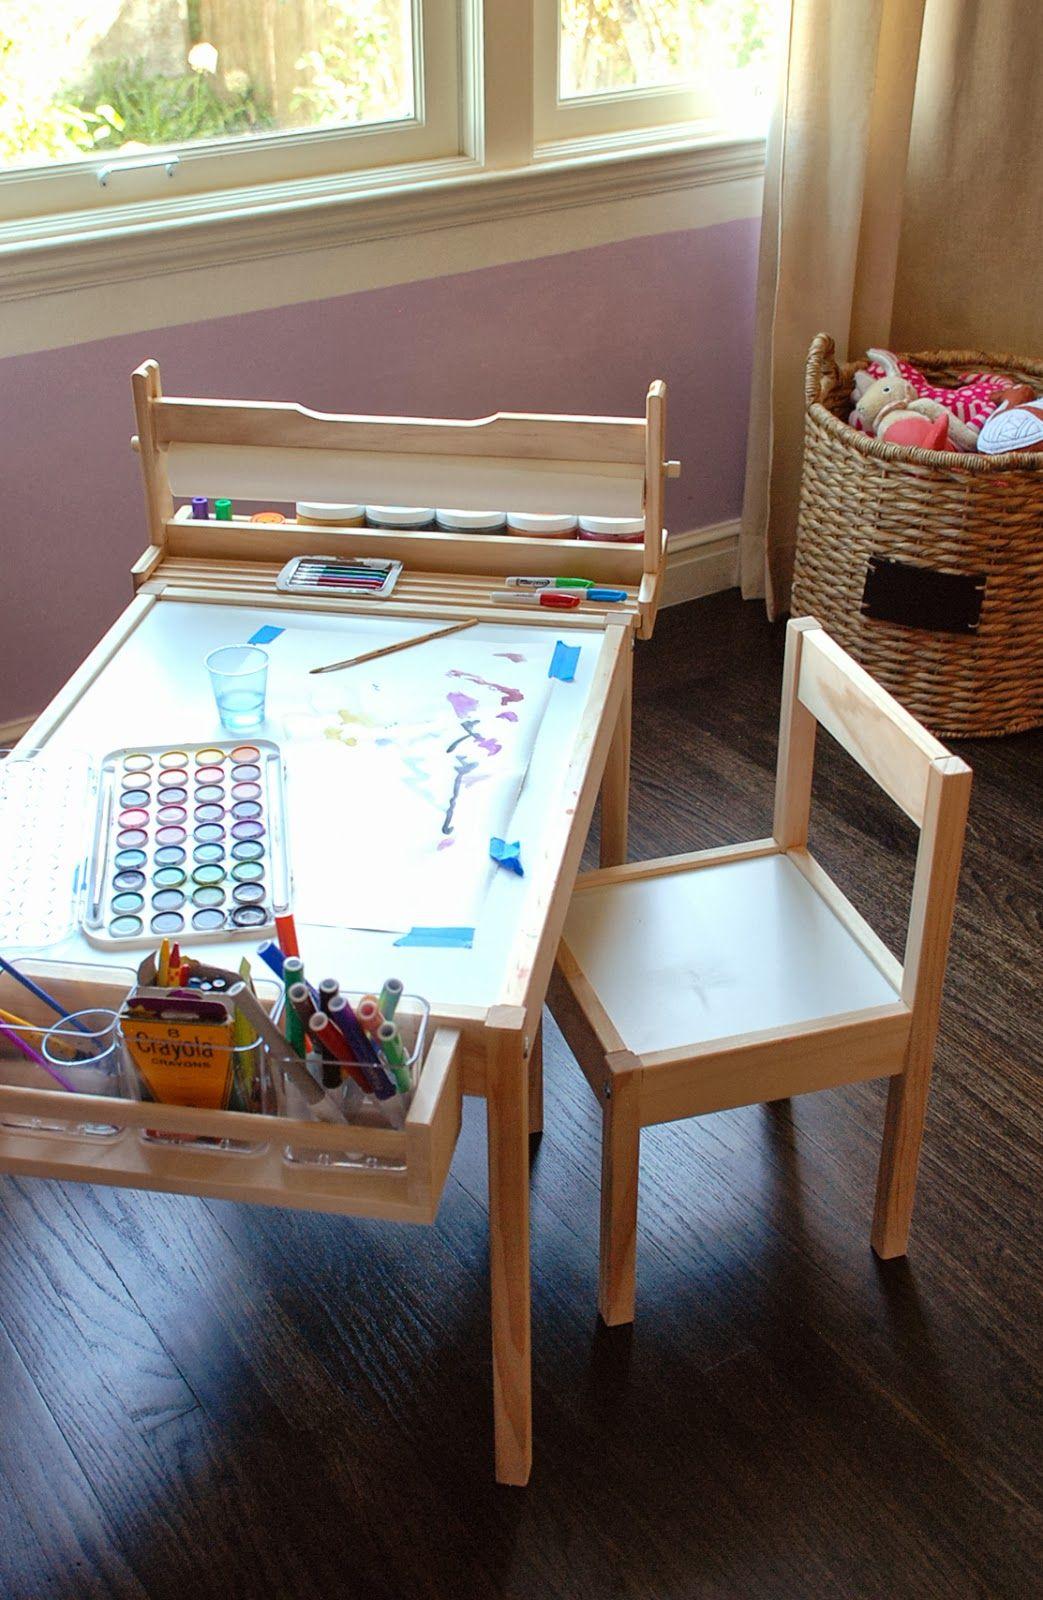 Design Ingenuity Diy Kids Craft Table Kids Craft Tables Craft